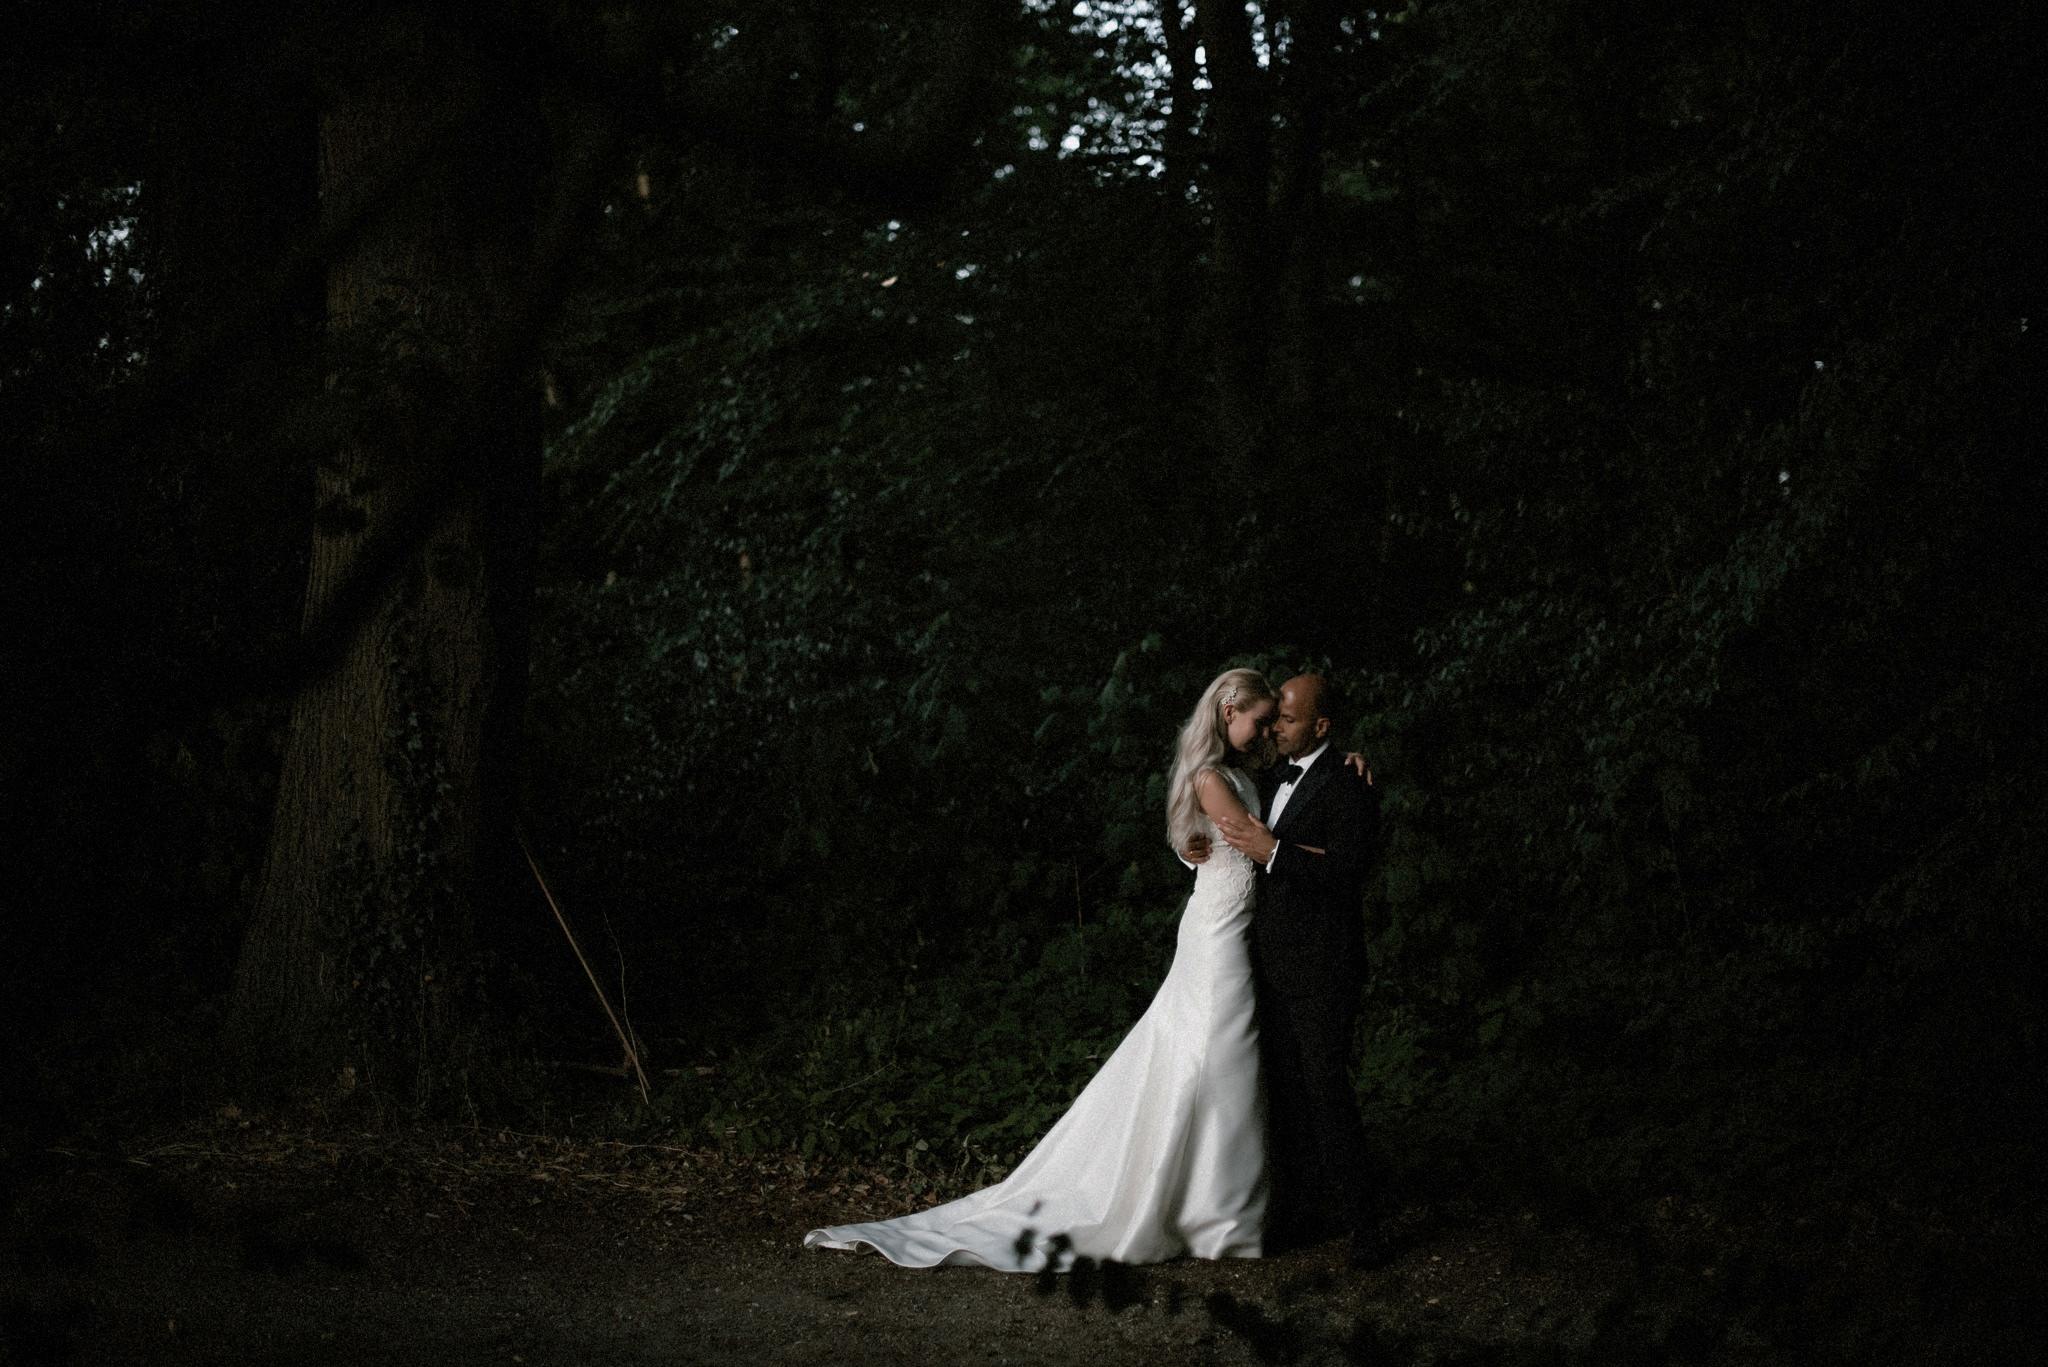 Bruidsfotografie Buitenplaats Sparrendaal - Naomi van der Kraan 0077.jpg